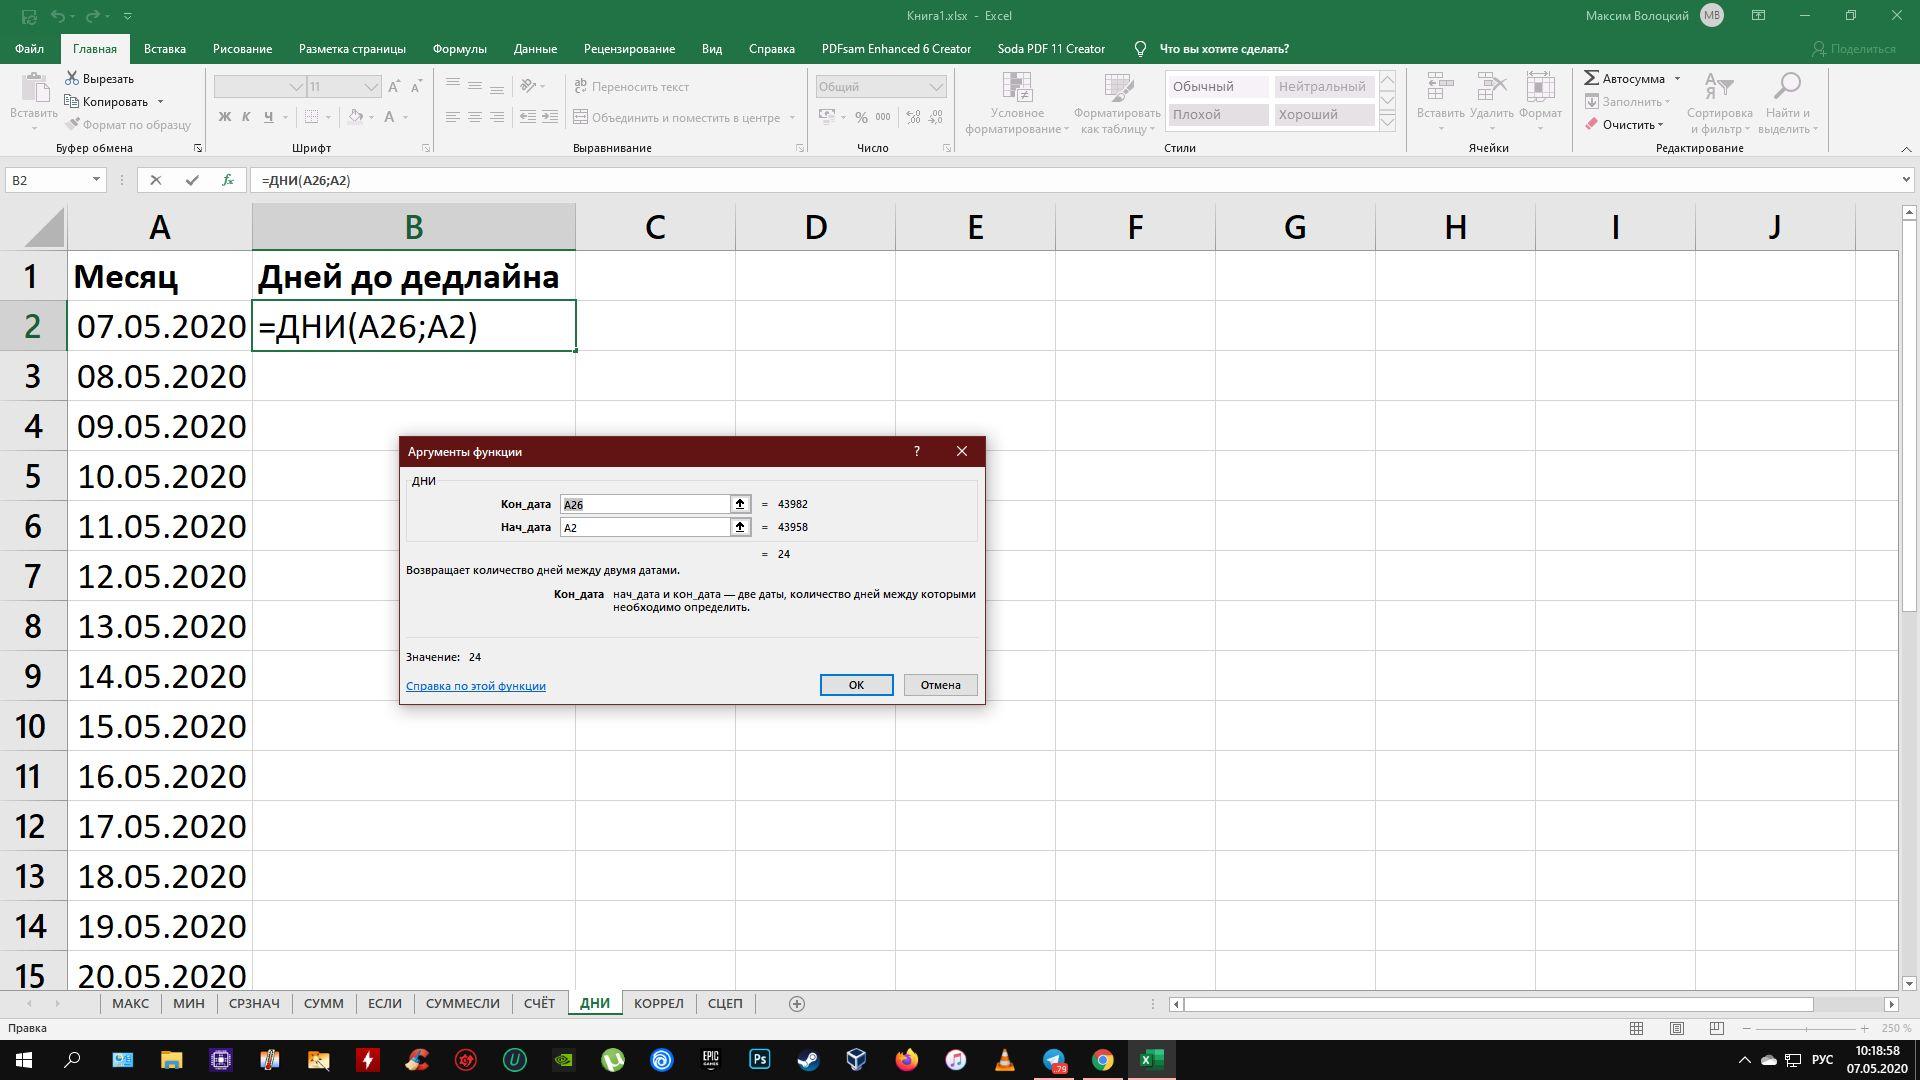 10 formul v excel yak polegshat vam zhittya 8 - 10 формул в Excel, які полегшать вам життя